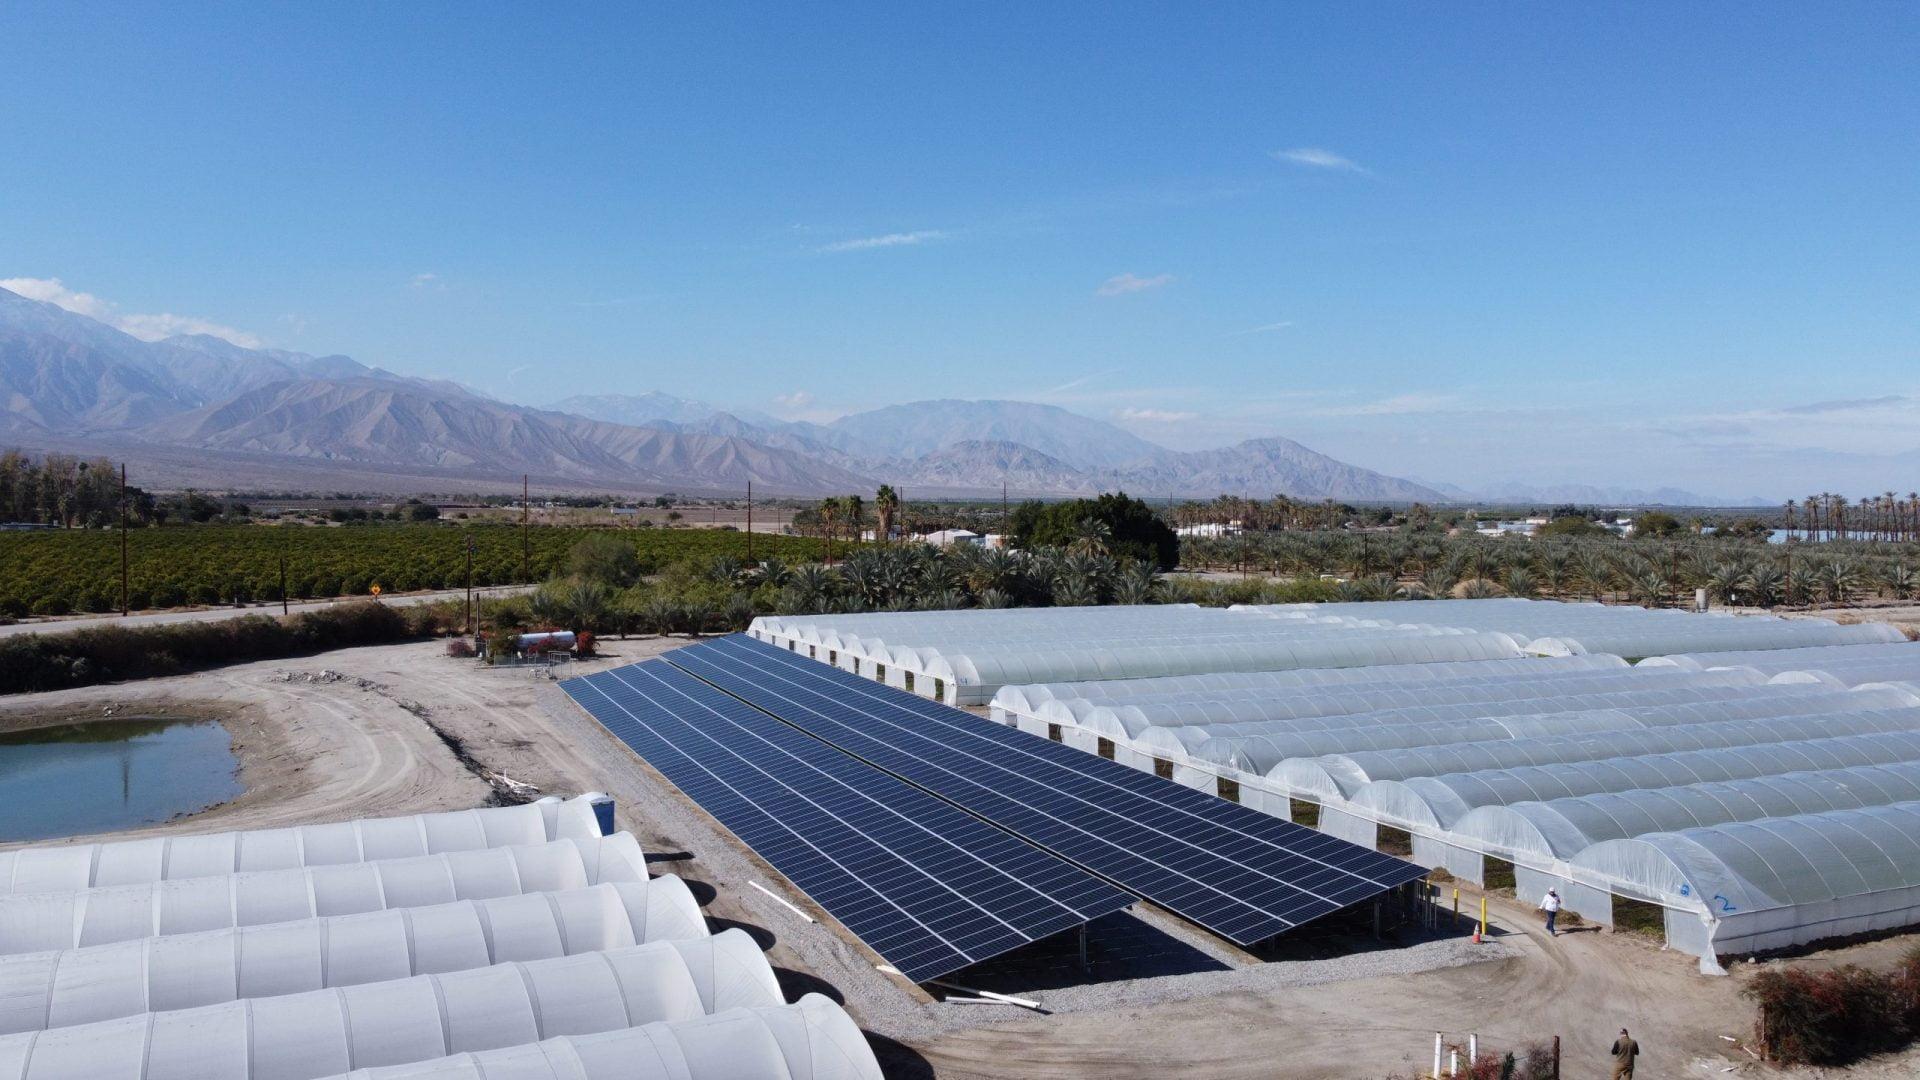 2-Long - Long Life Farms Agriclutural Solar - Thermal, CA